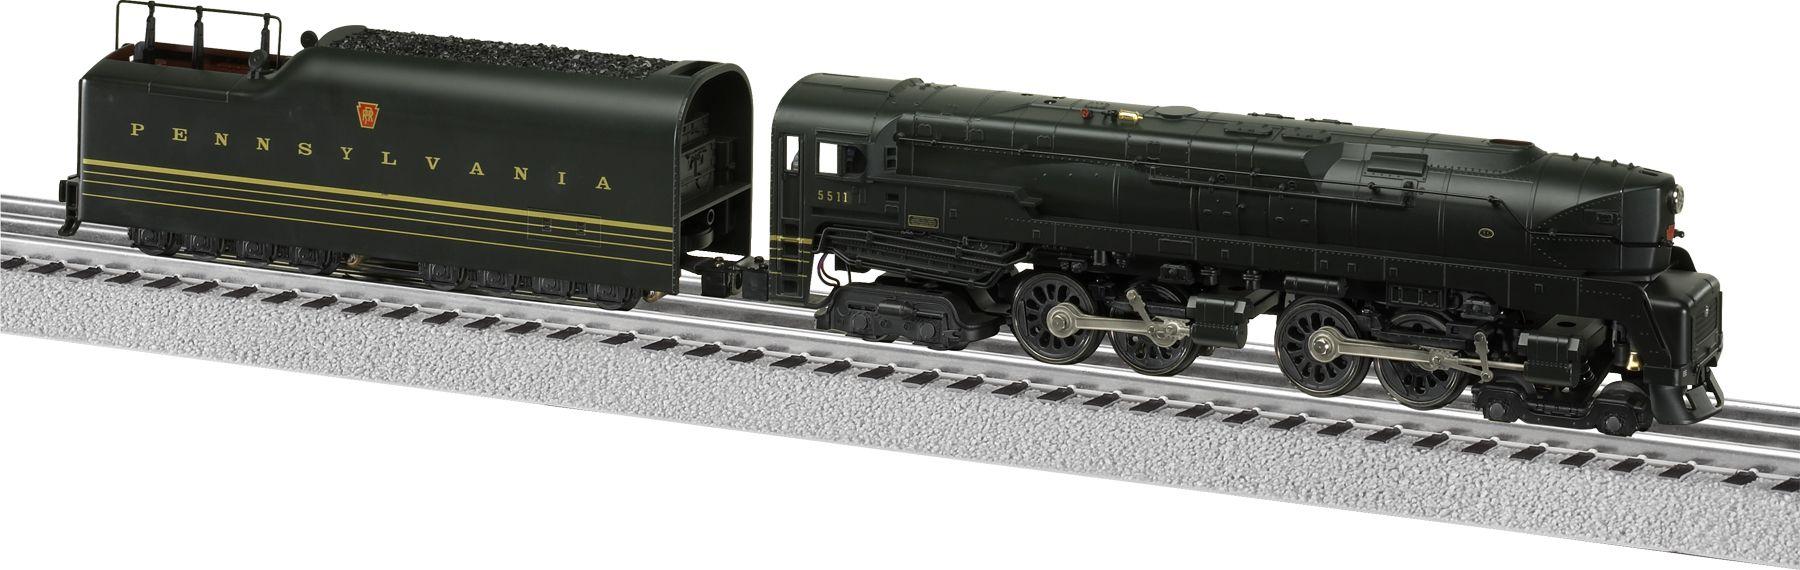 Pennsylvania LionMaster LEGACY 4-4-4-4 T-1 Duplex #5511   Legacy. Duplex. Model trains